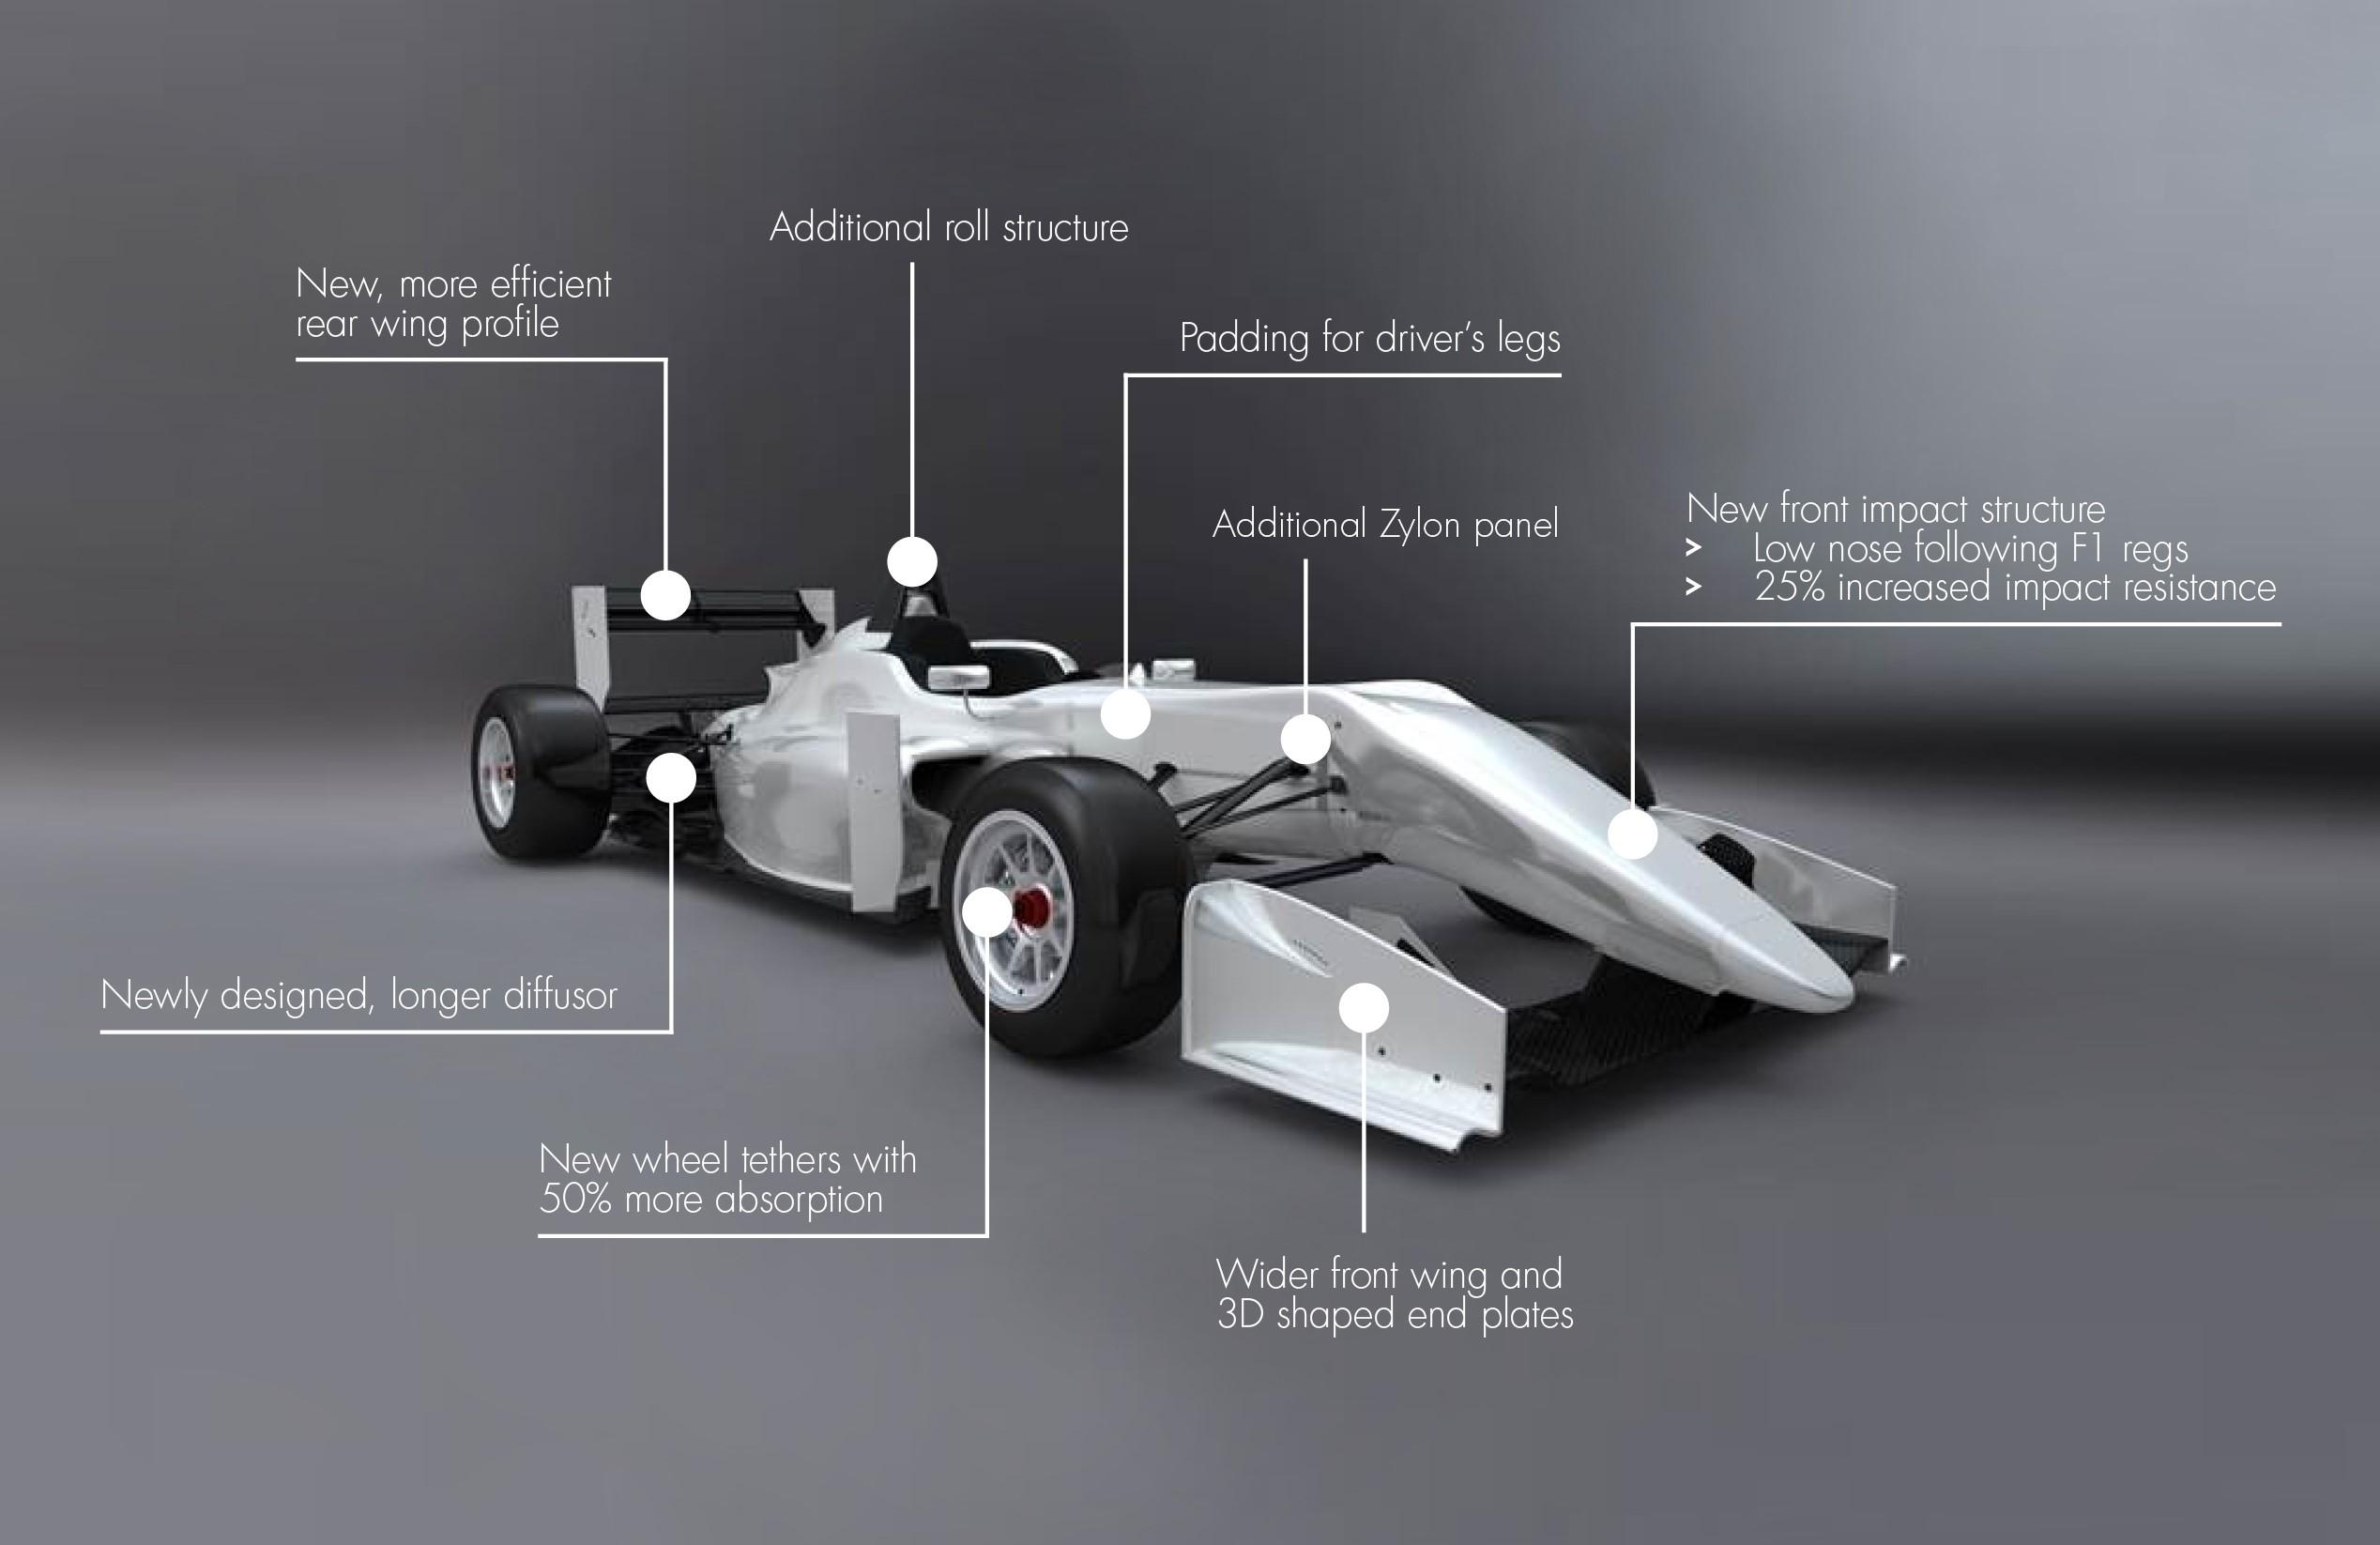 The 2017 Fia Formula 3 European Championship Car Another Step Forward Federation Internationale De L Automobile